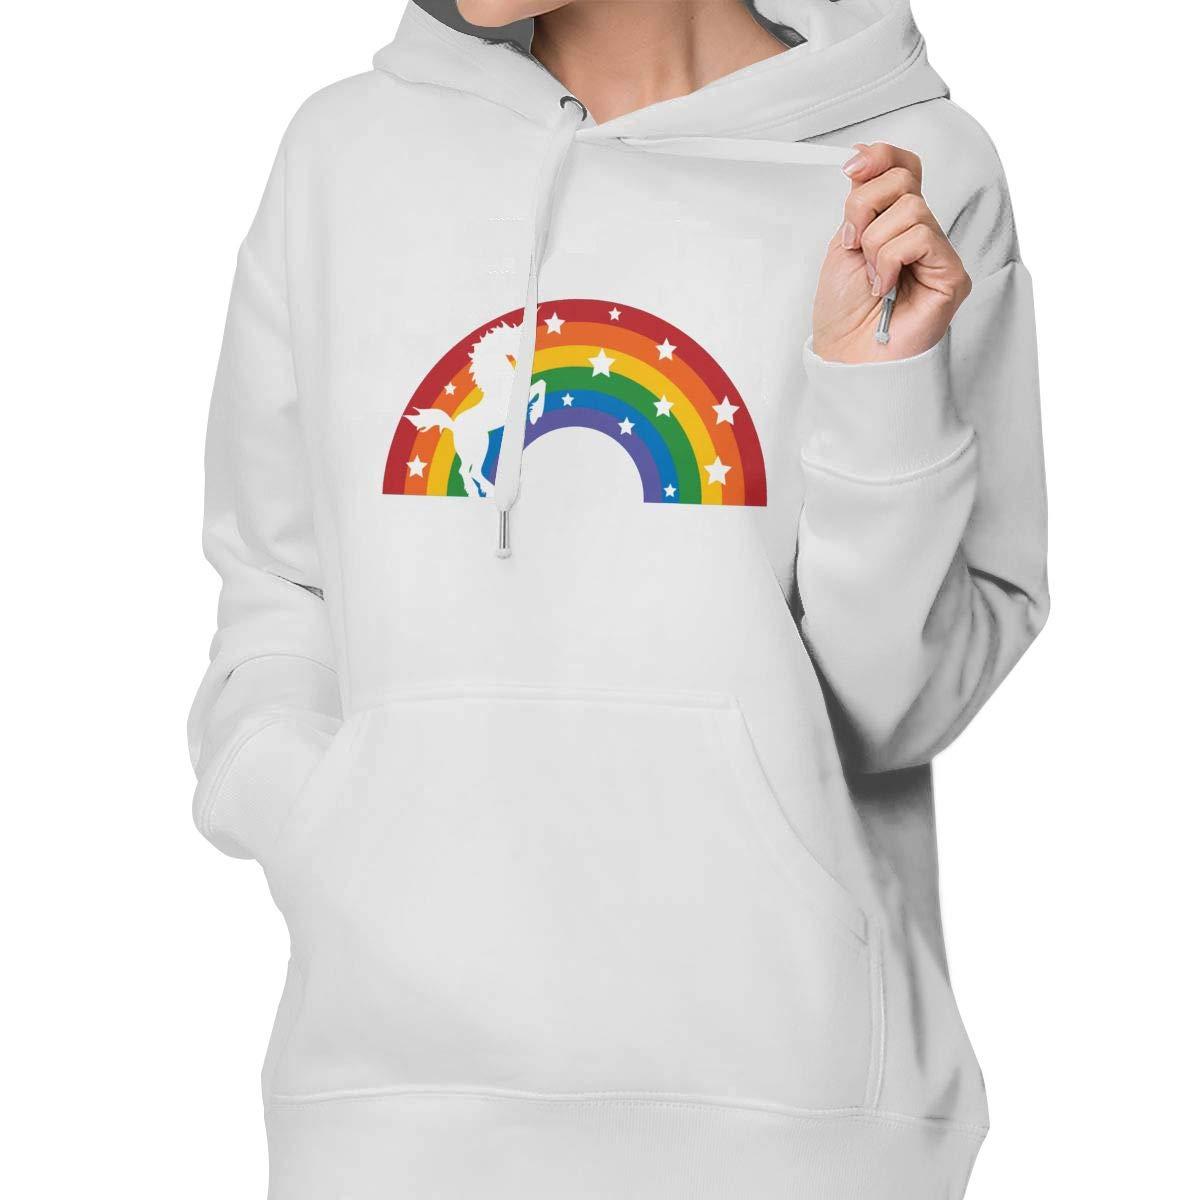 Aiguan Retro Rainbow Unicorn Womens Hoodie Sweatshirt with Pocket